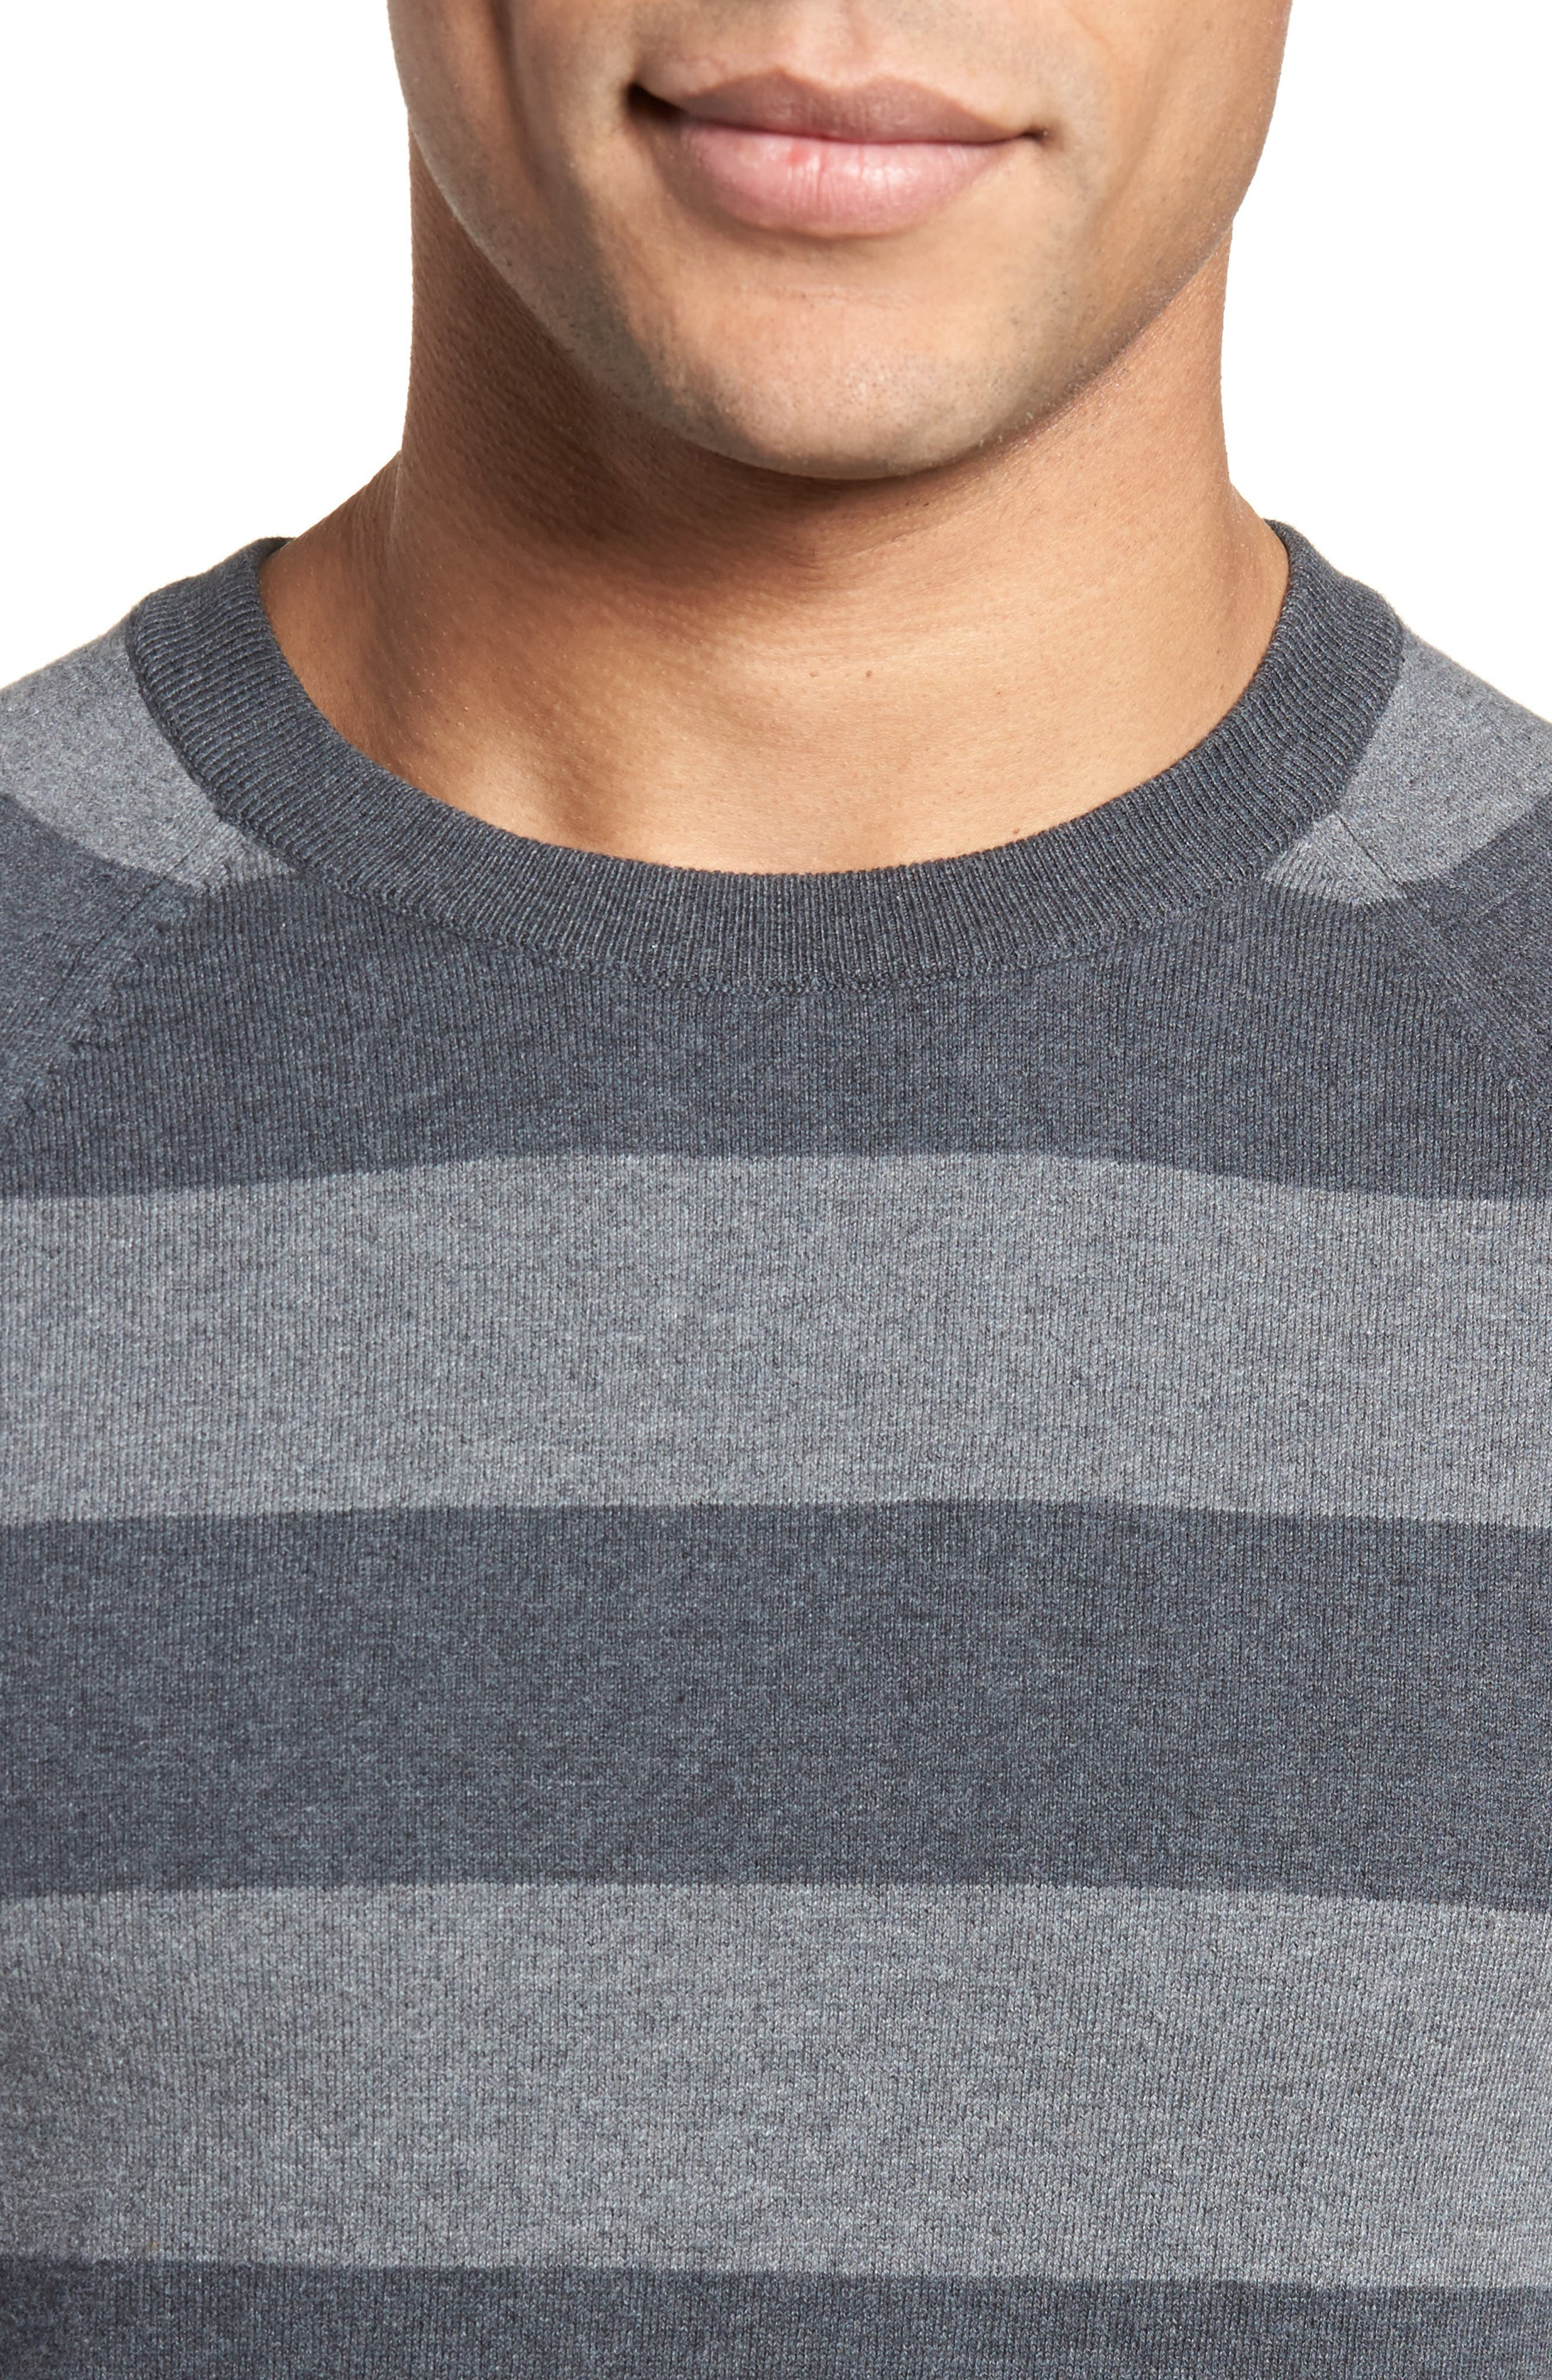 Stripe Stretch Cotton Sweater,                             Alternate thumbnail 4, color,